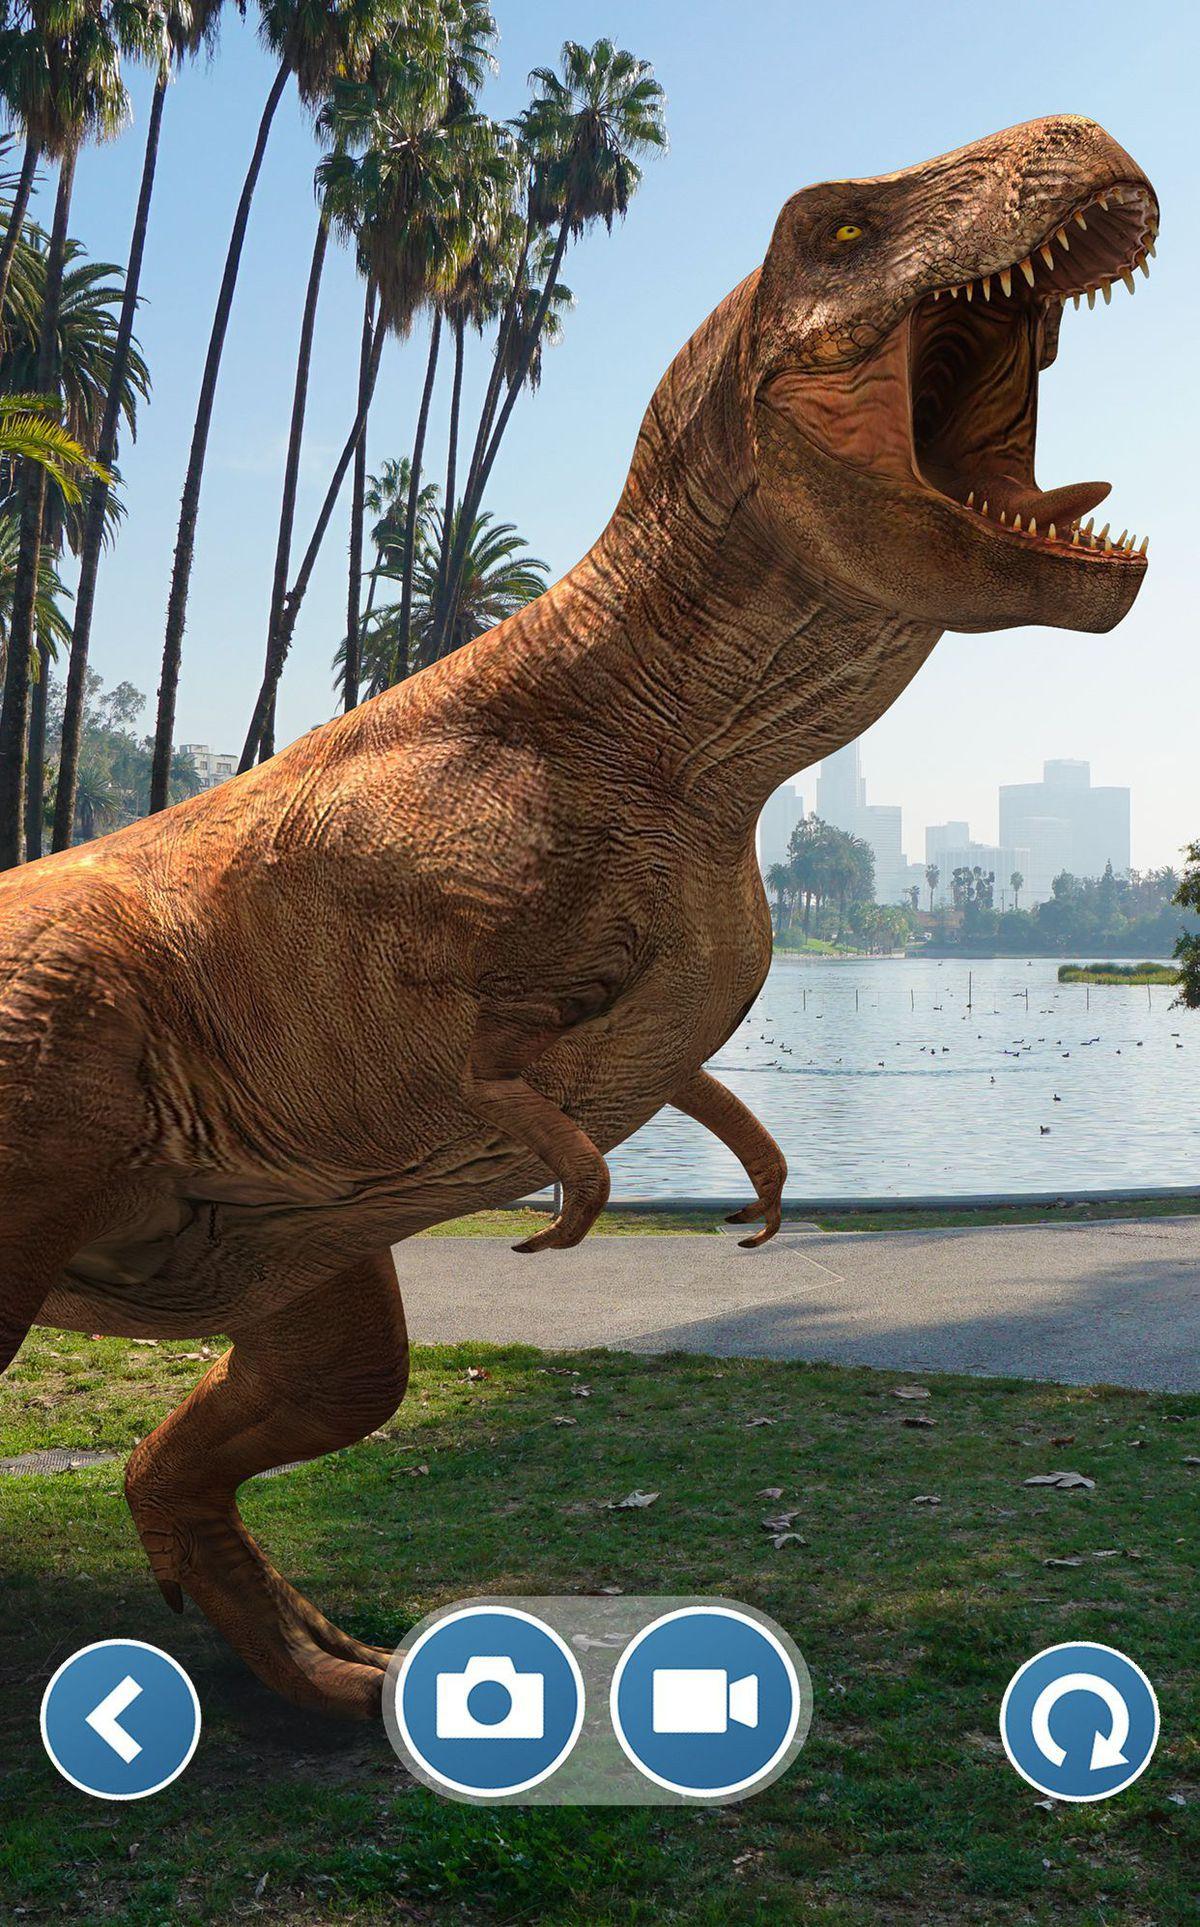 Jurassic World Alive looks like Pokémon Go but with giant